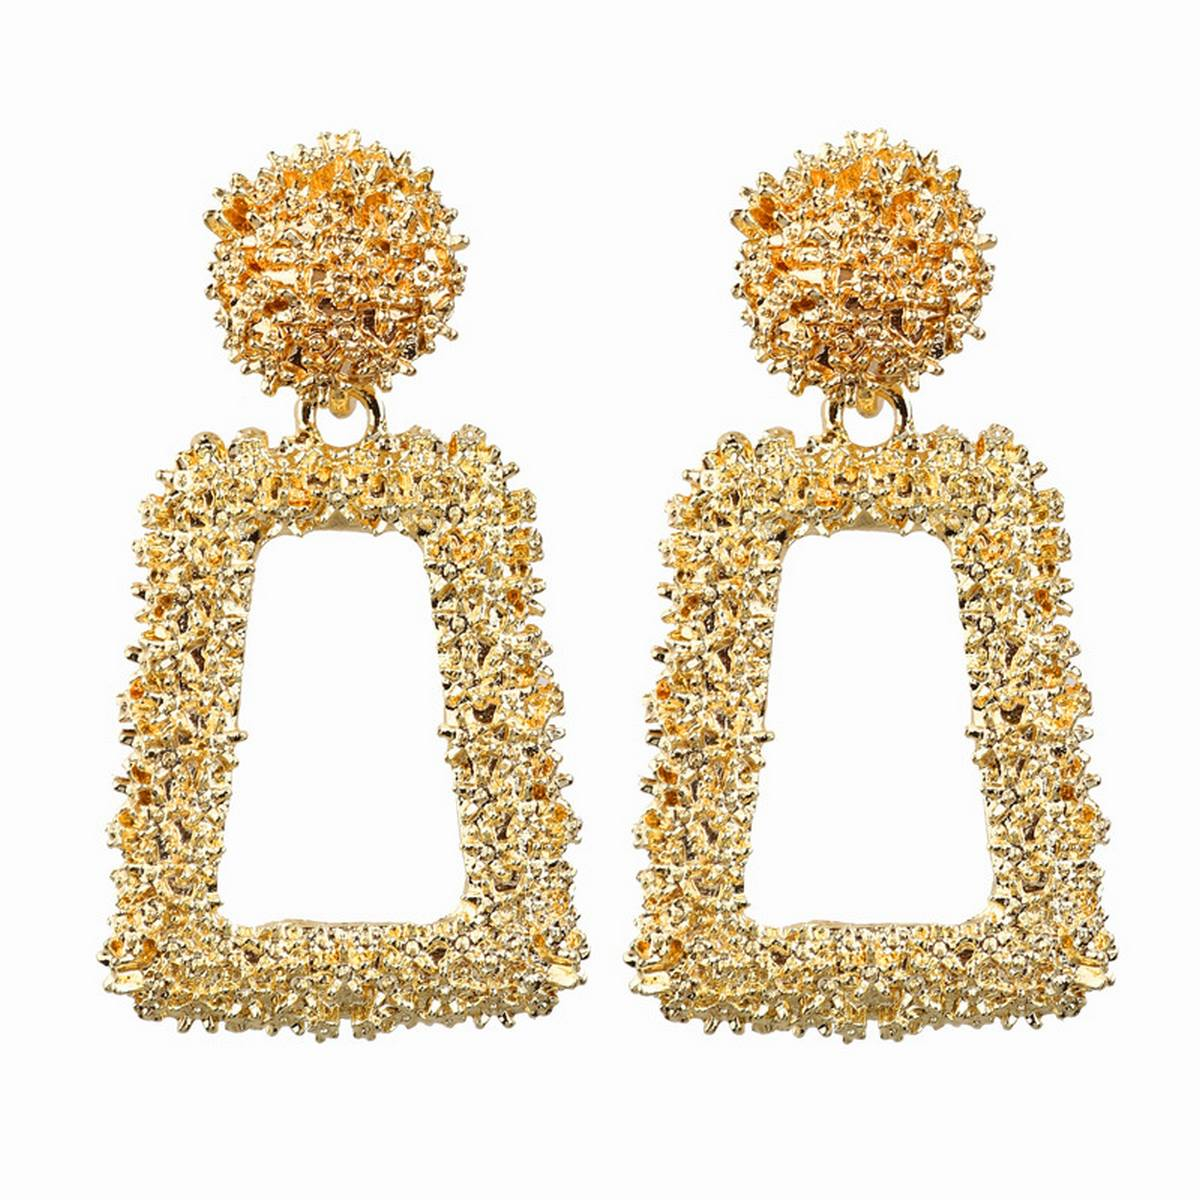 Small Golden Earrings For Women | Hanging Dangle Circle Ear ring for Girls